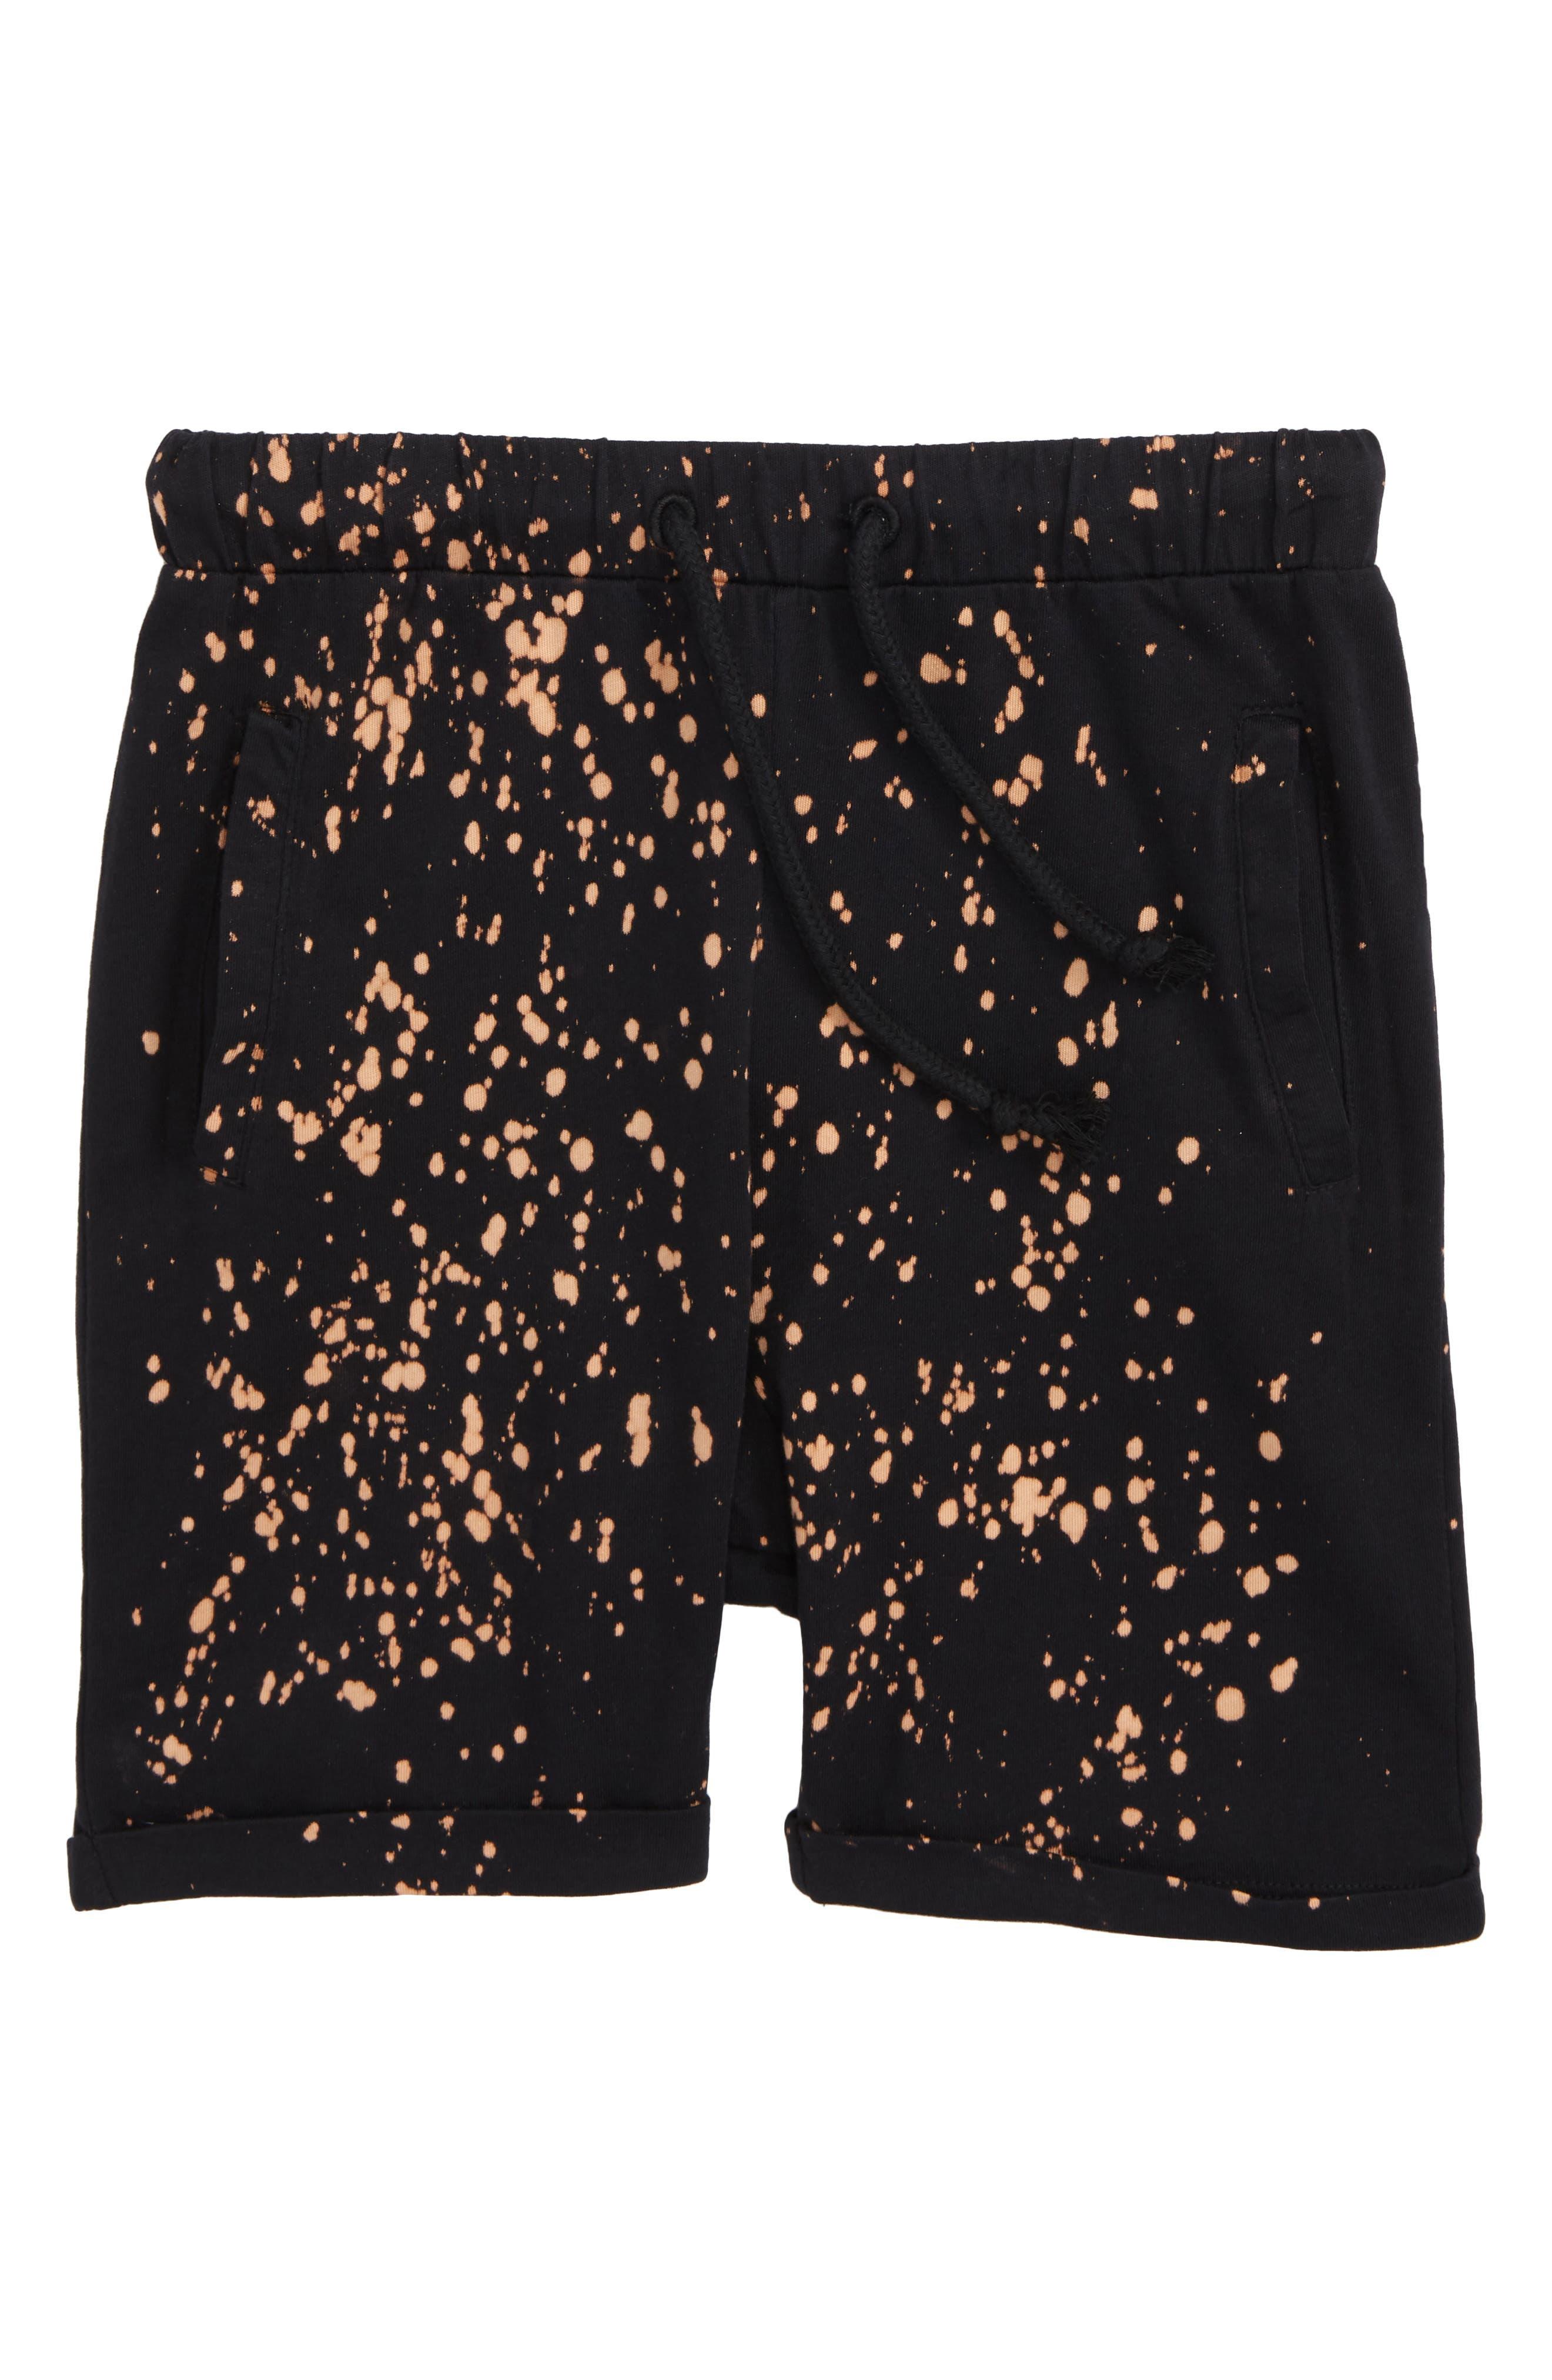 Avalon Knit Shorts,                         Main,                         color, 001